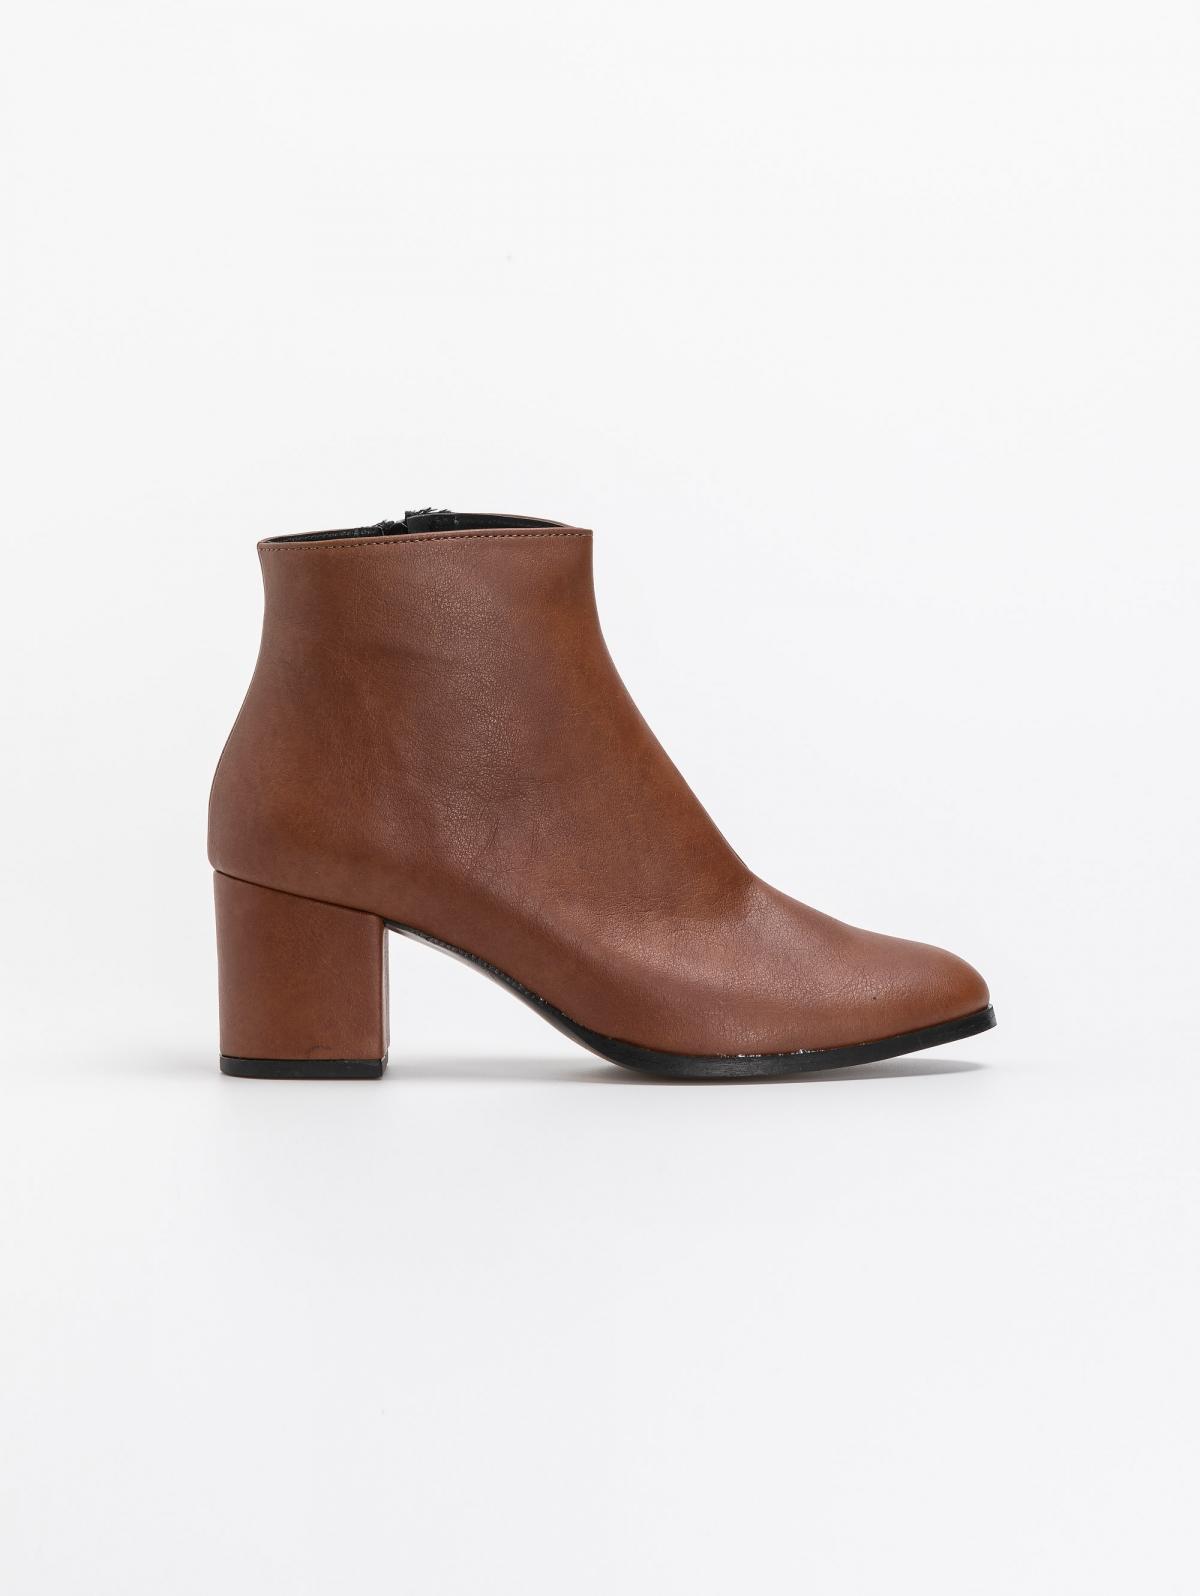 Estil basic ankle boots σε στρογγυλή γραμμή - Ταμπά